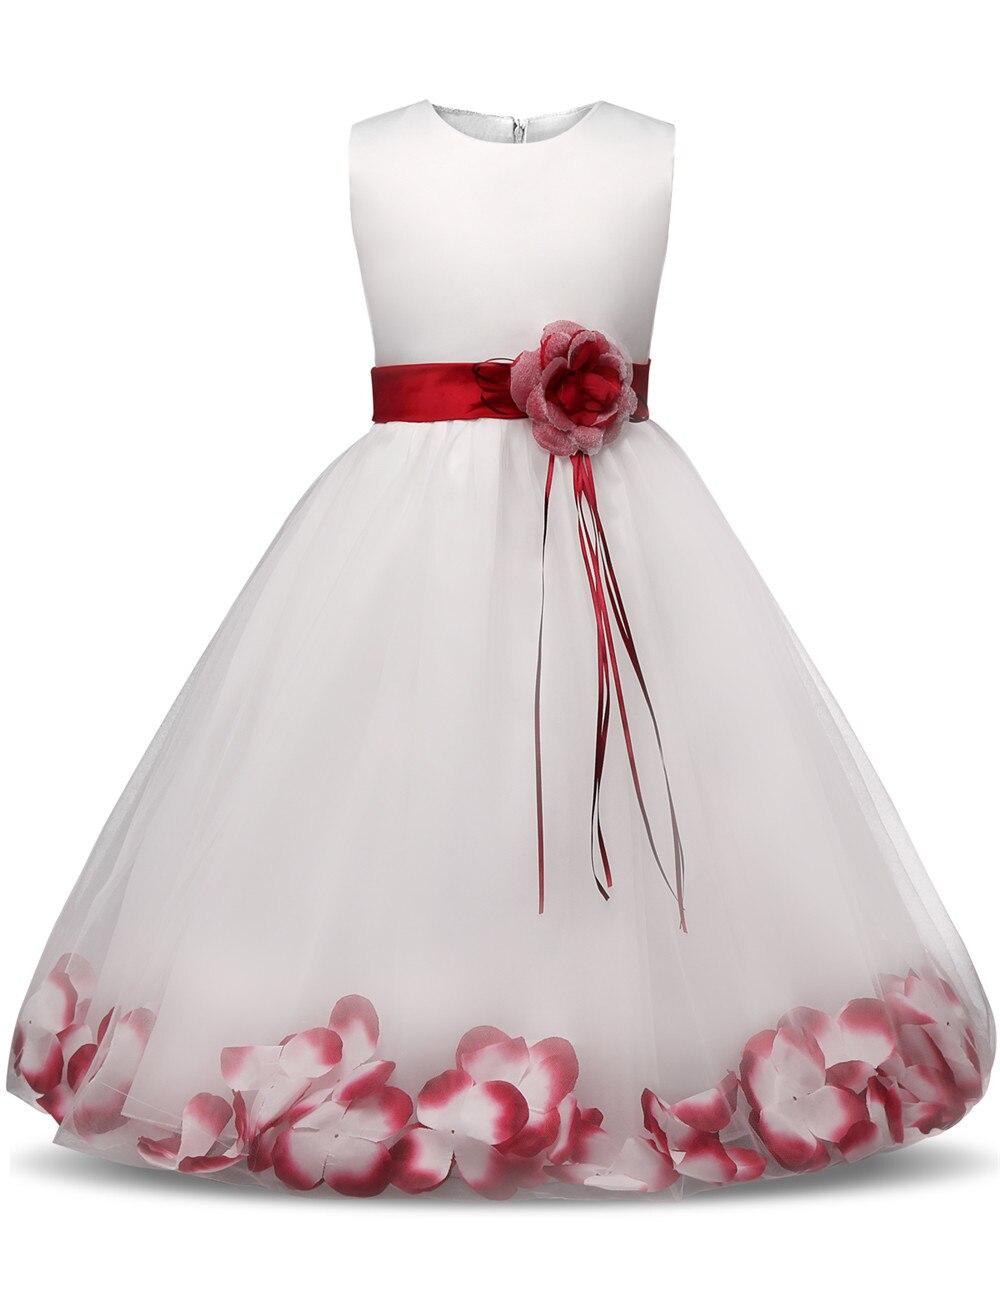 feecb414d0 US $8.17 13% OFF|Flower Girl Dress Summer Clothes Girl 2018 Baby Girl  Wedding Veil Dresses Kids's Party Wear Costume For Girl Children  Clothing-in ...